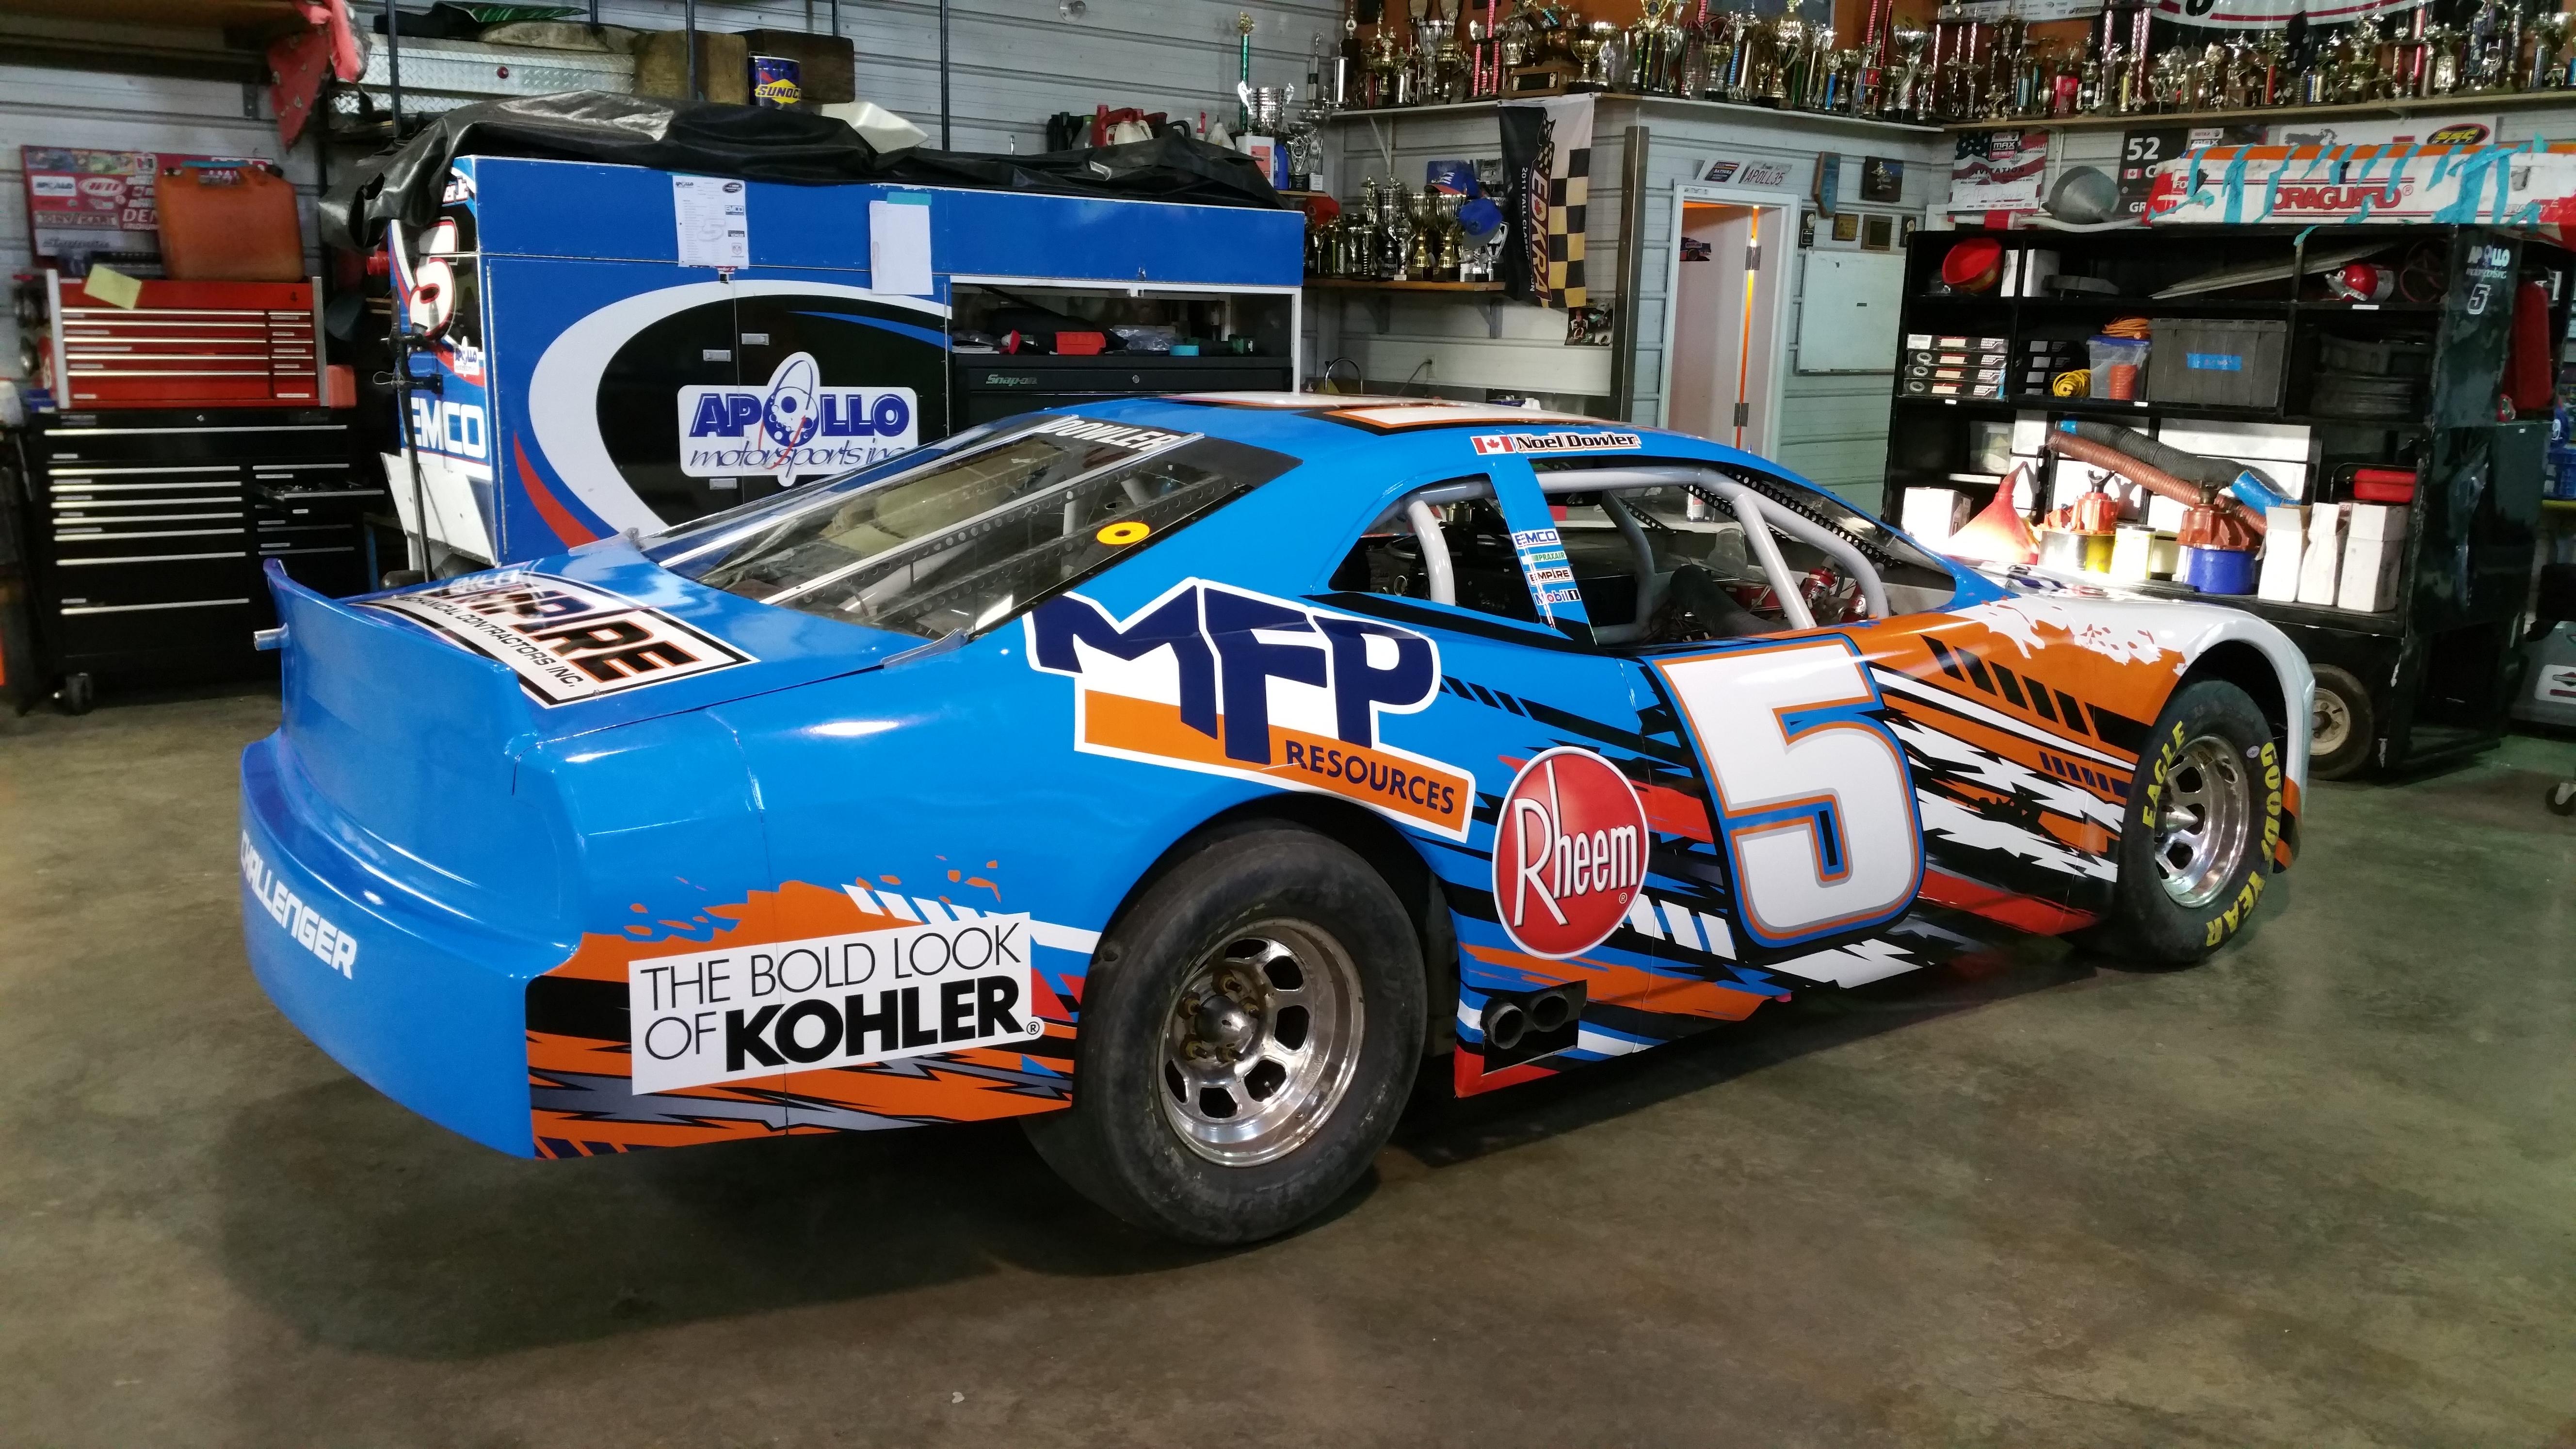 NASCAR #5 wrap